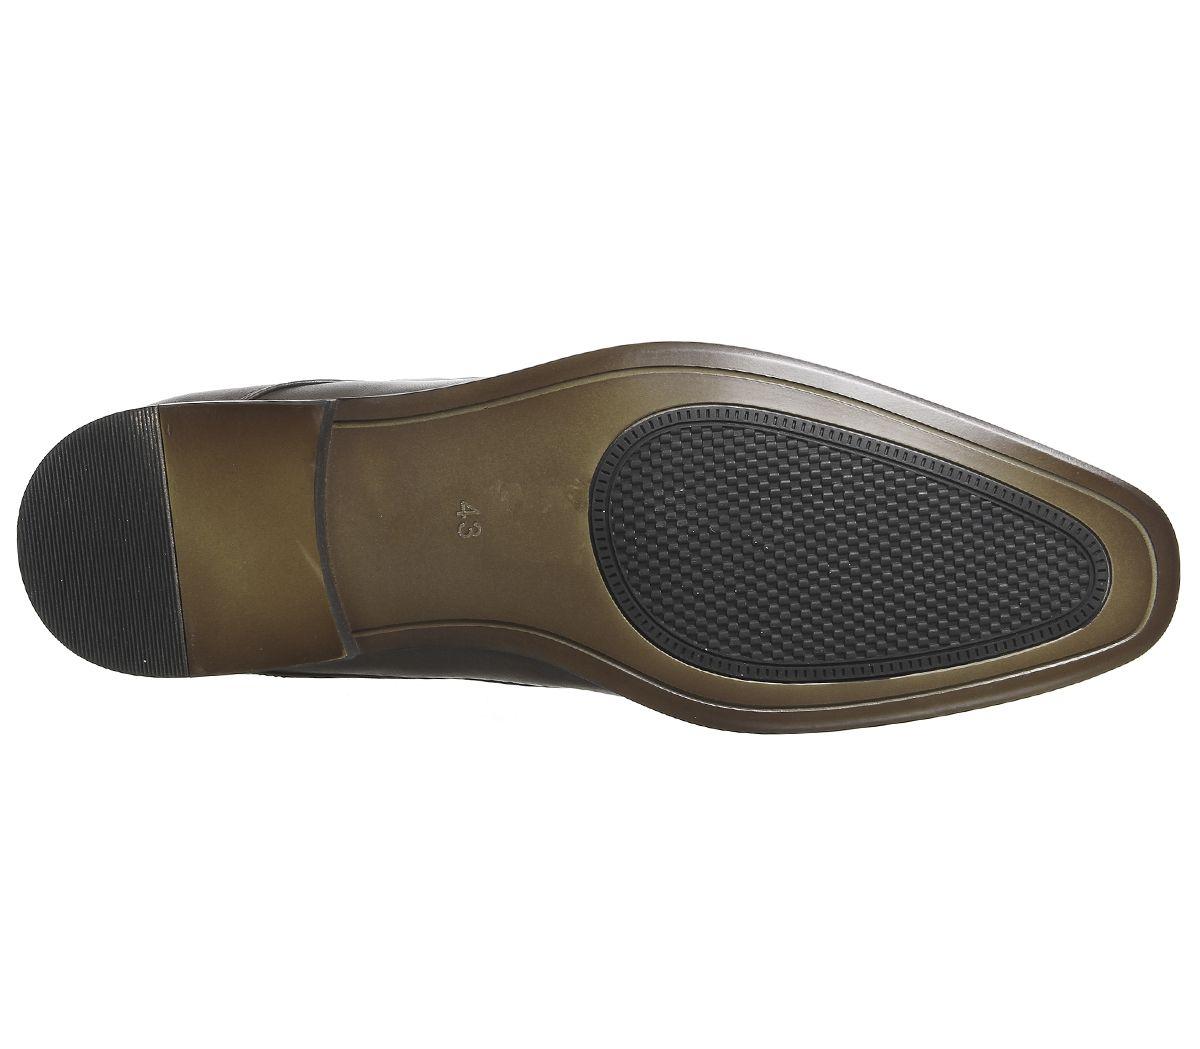 fa25bad3b85 Office Glide Plain Toe Shoes Choc - Smart